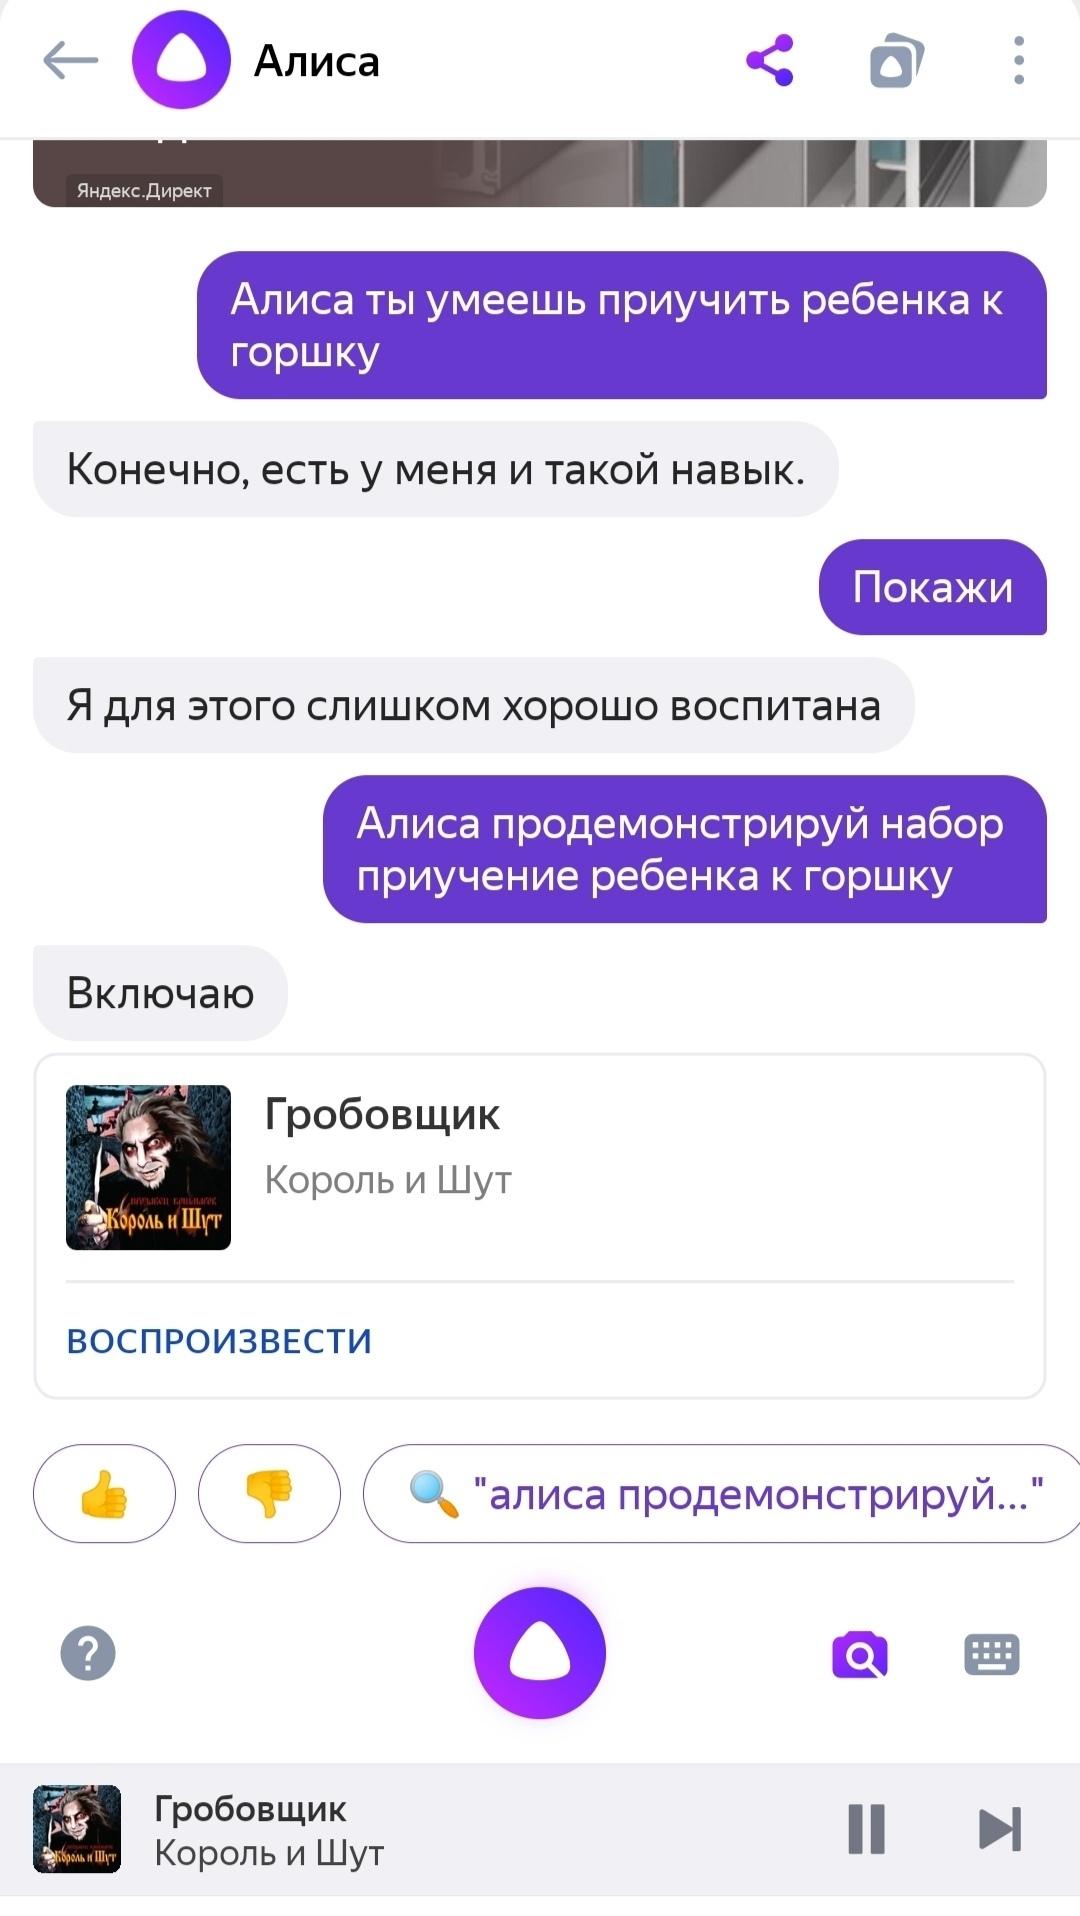 Алиса умничка)